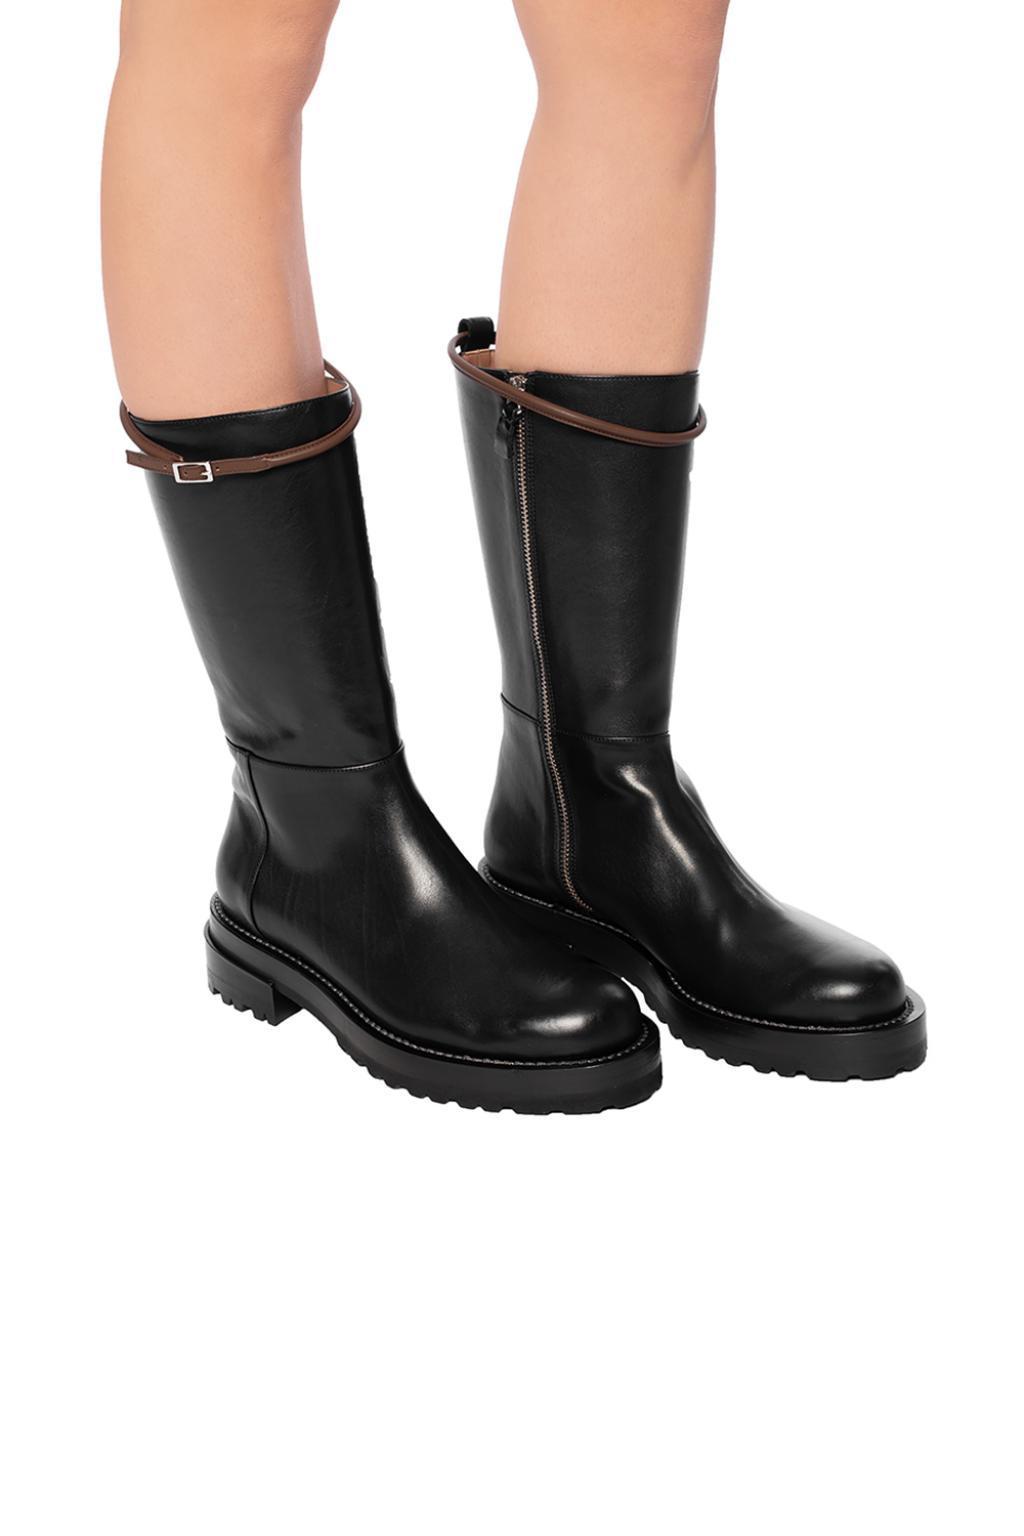 6dbb05455d60 Marni - Black Embellished Ankle Boots - Lyst. View fullscreen